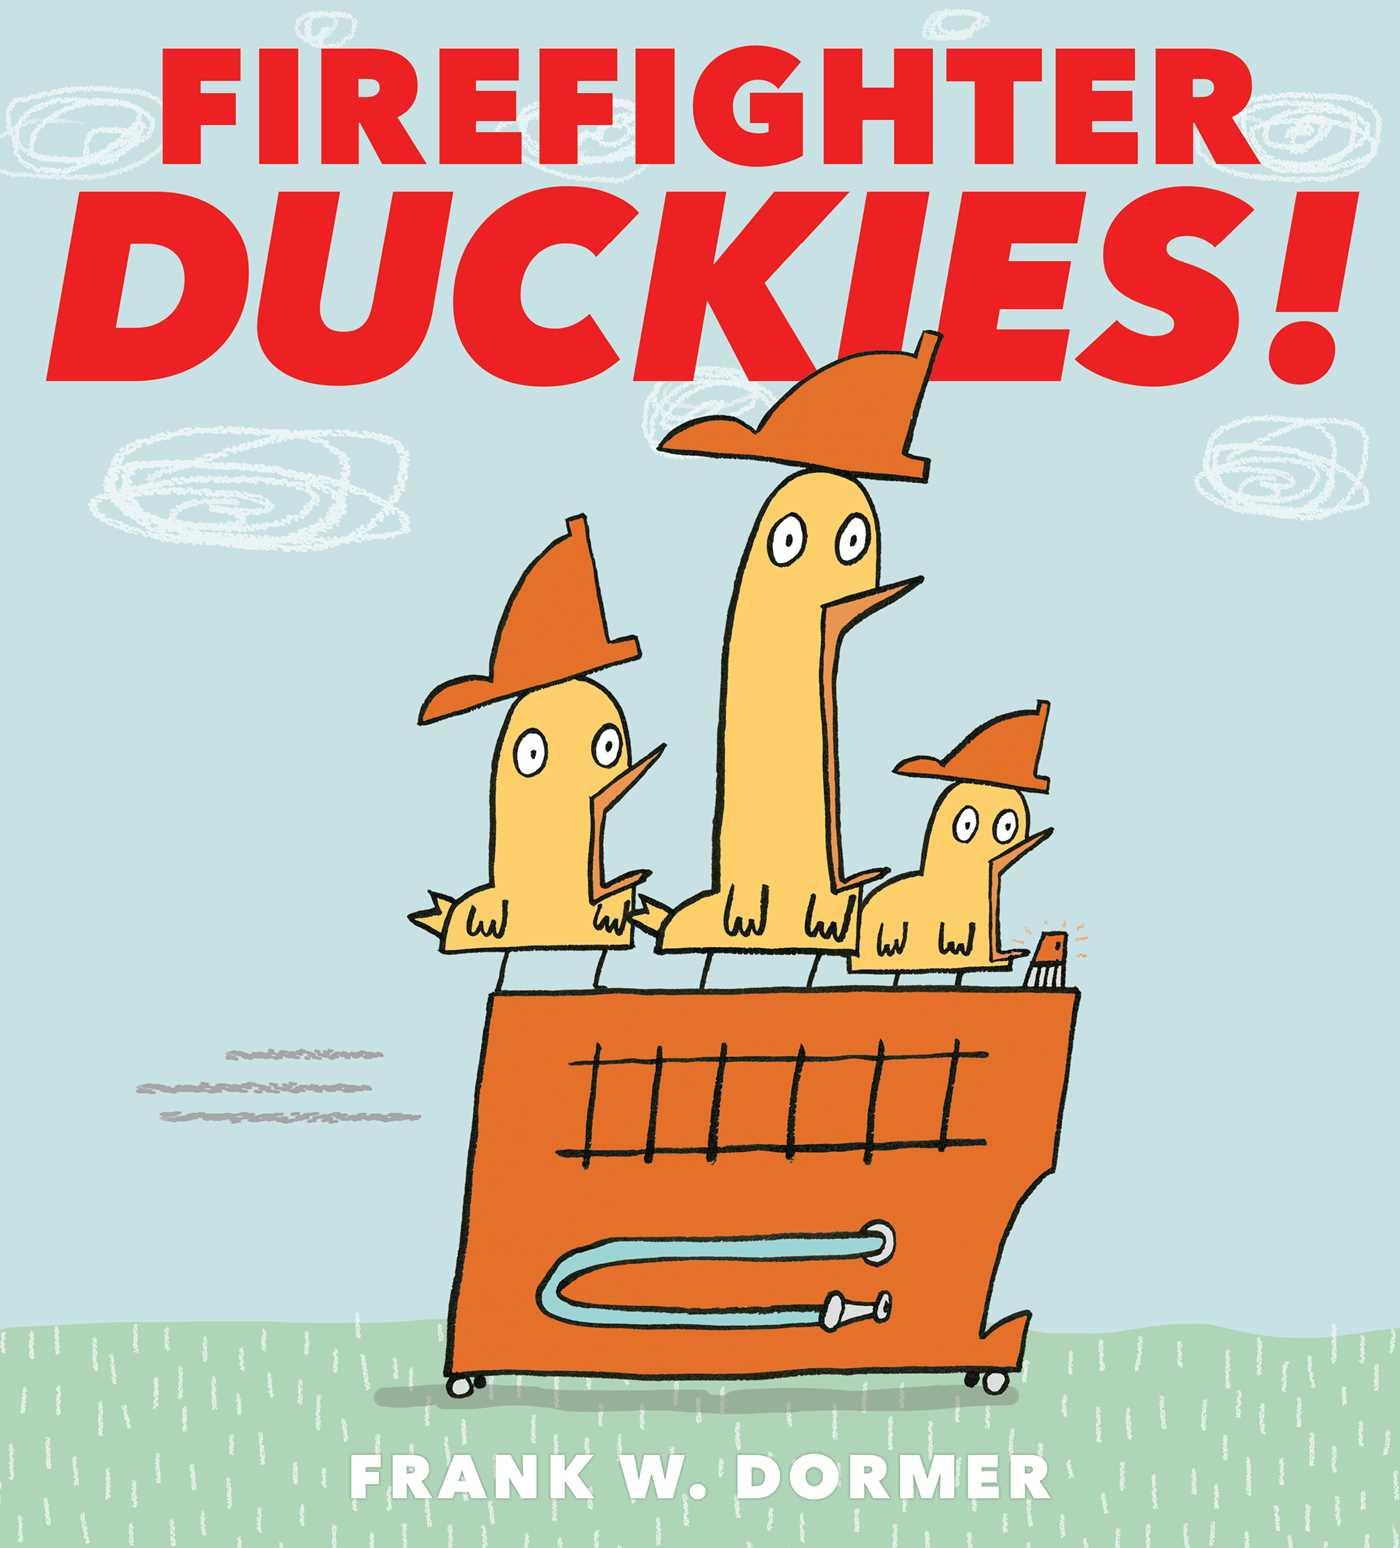 Firefighter duckies 9781481460903 hr